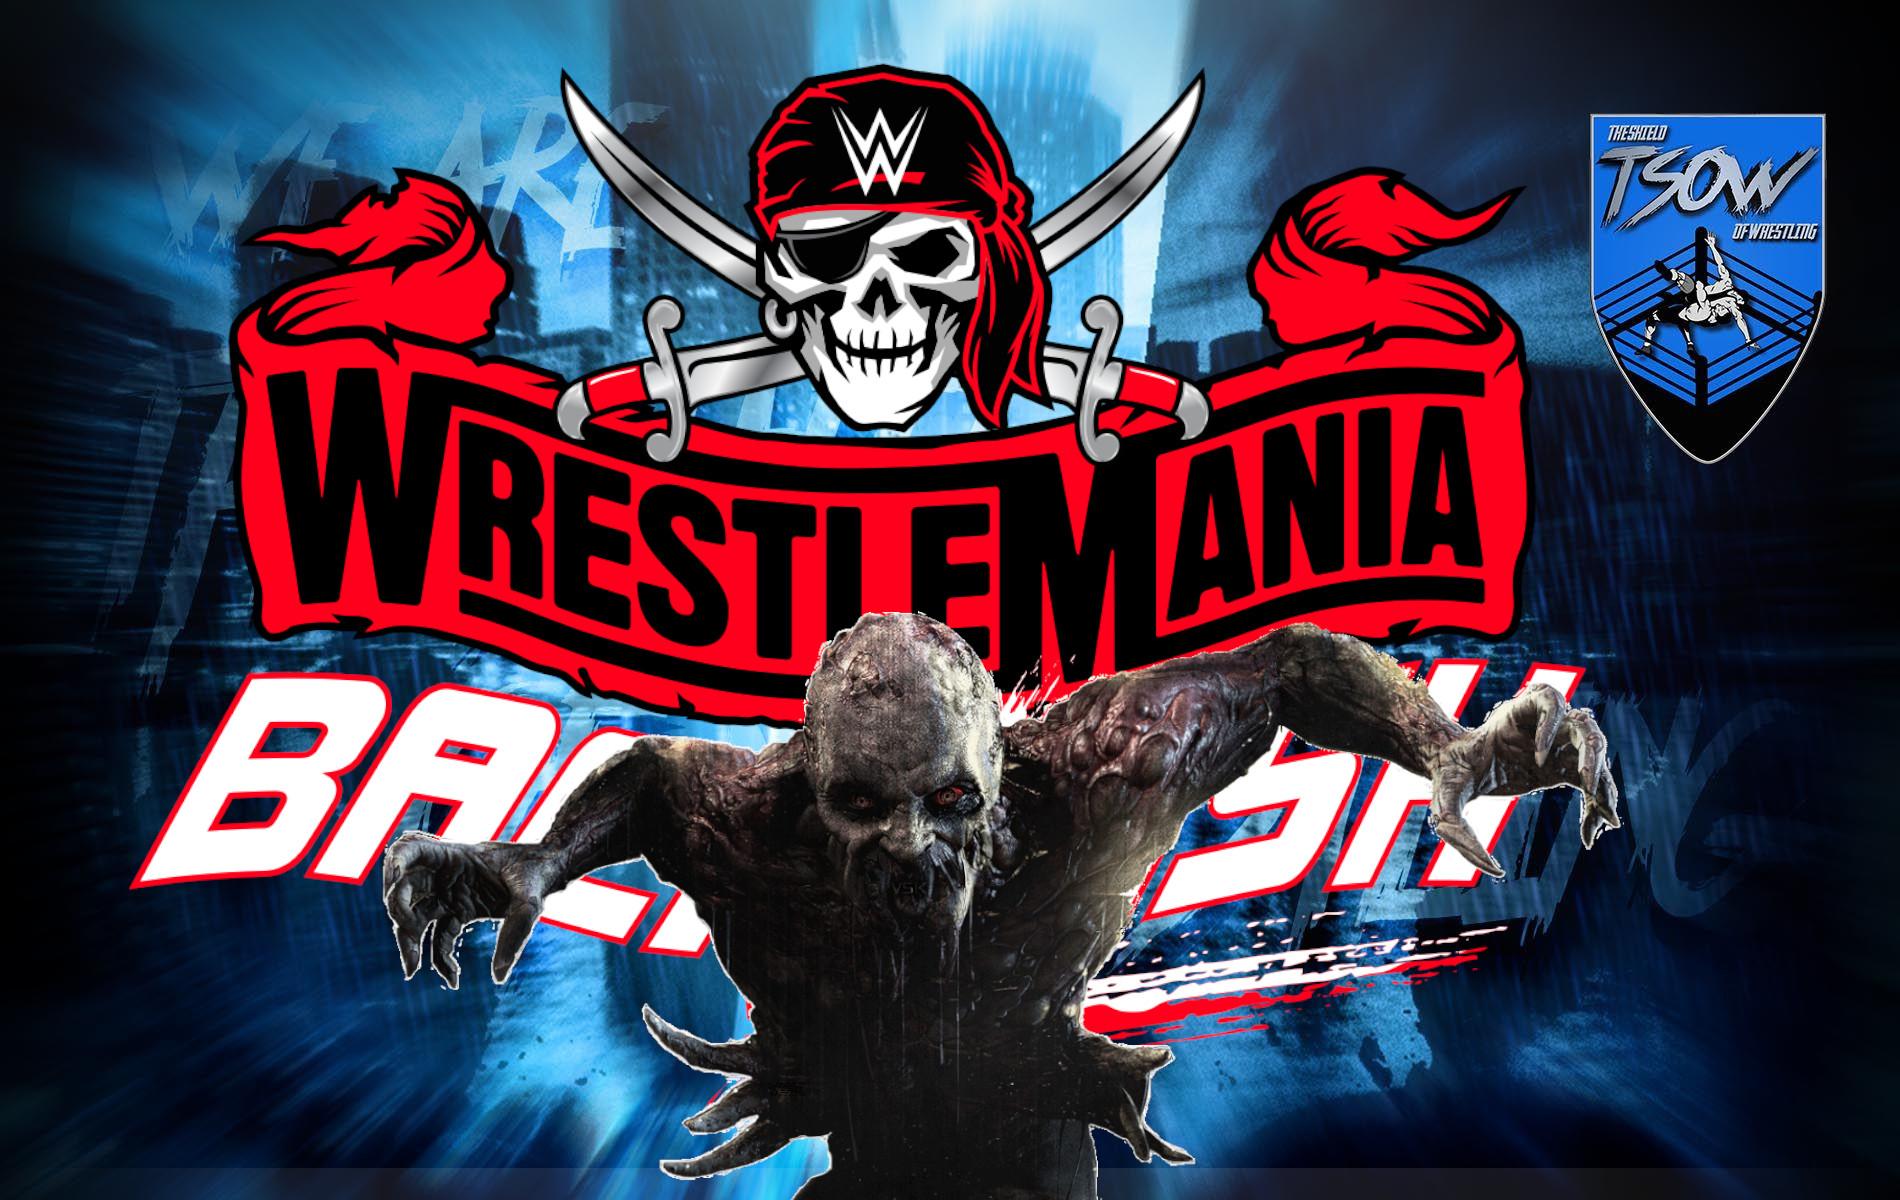 WrestleMania Backlash: rivelati chi erano i wrestler zombie